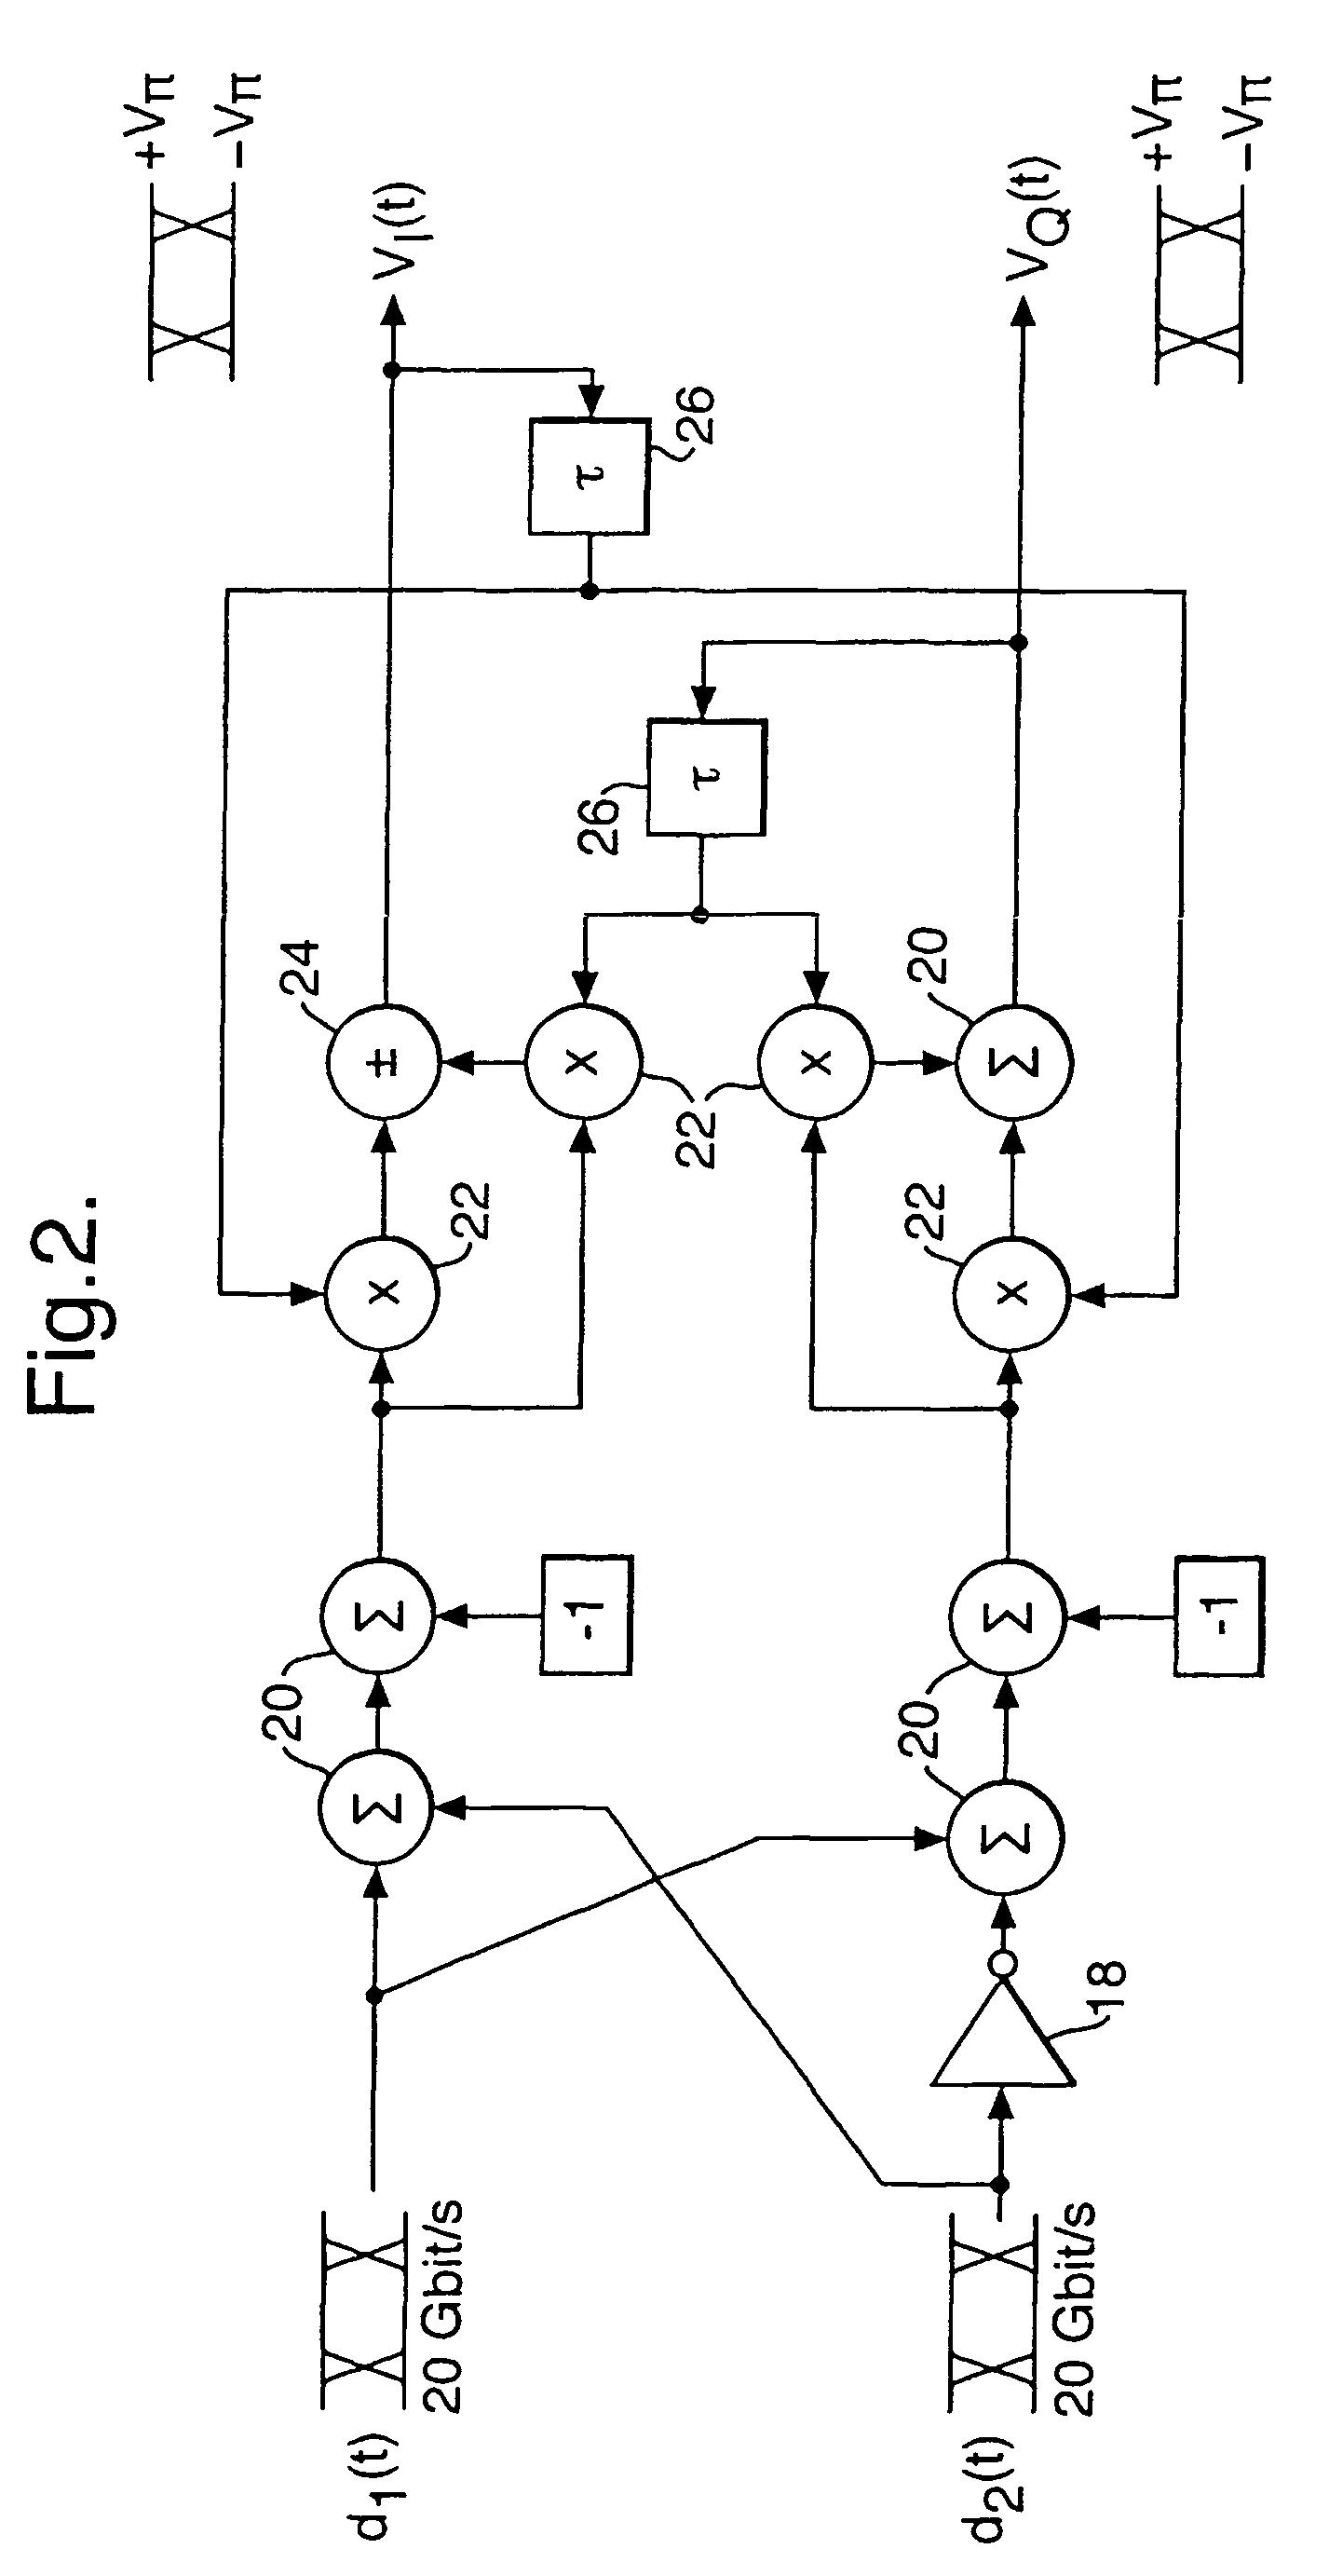 patent us7546041 - optical communications